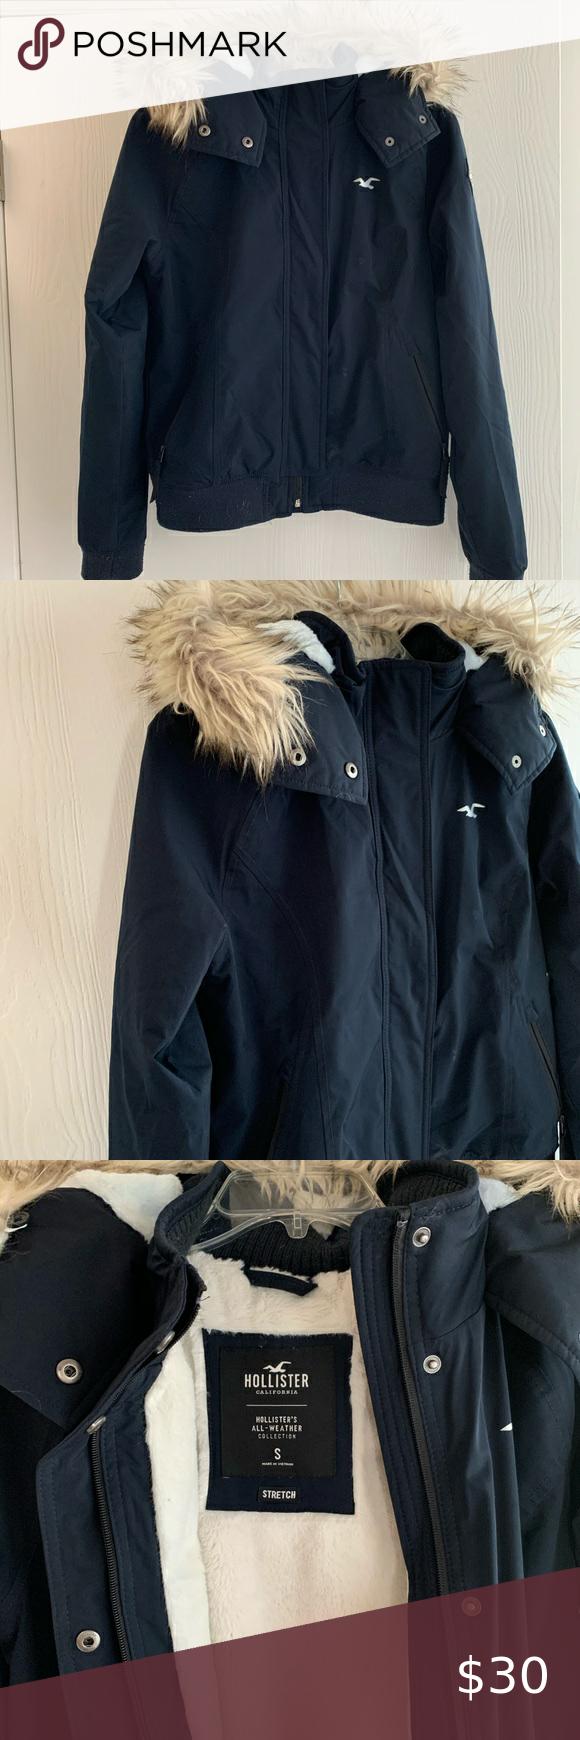 Hollister Winter Coat Sz Small Hollister Jackets Winter Coat Blue Jacket [ 1740 x 580 Pixel ]